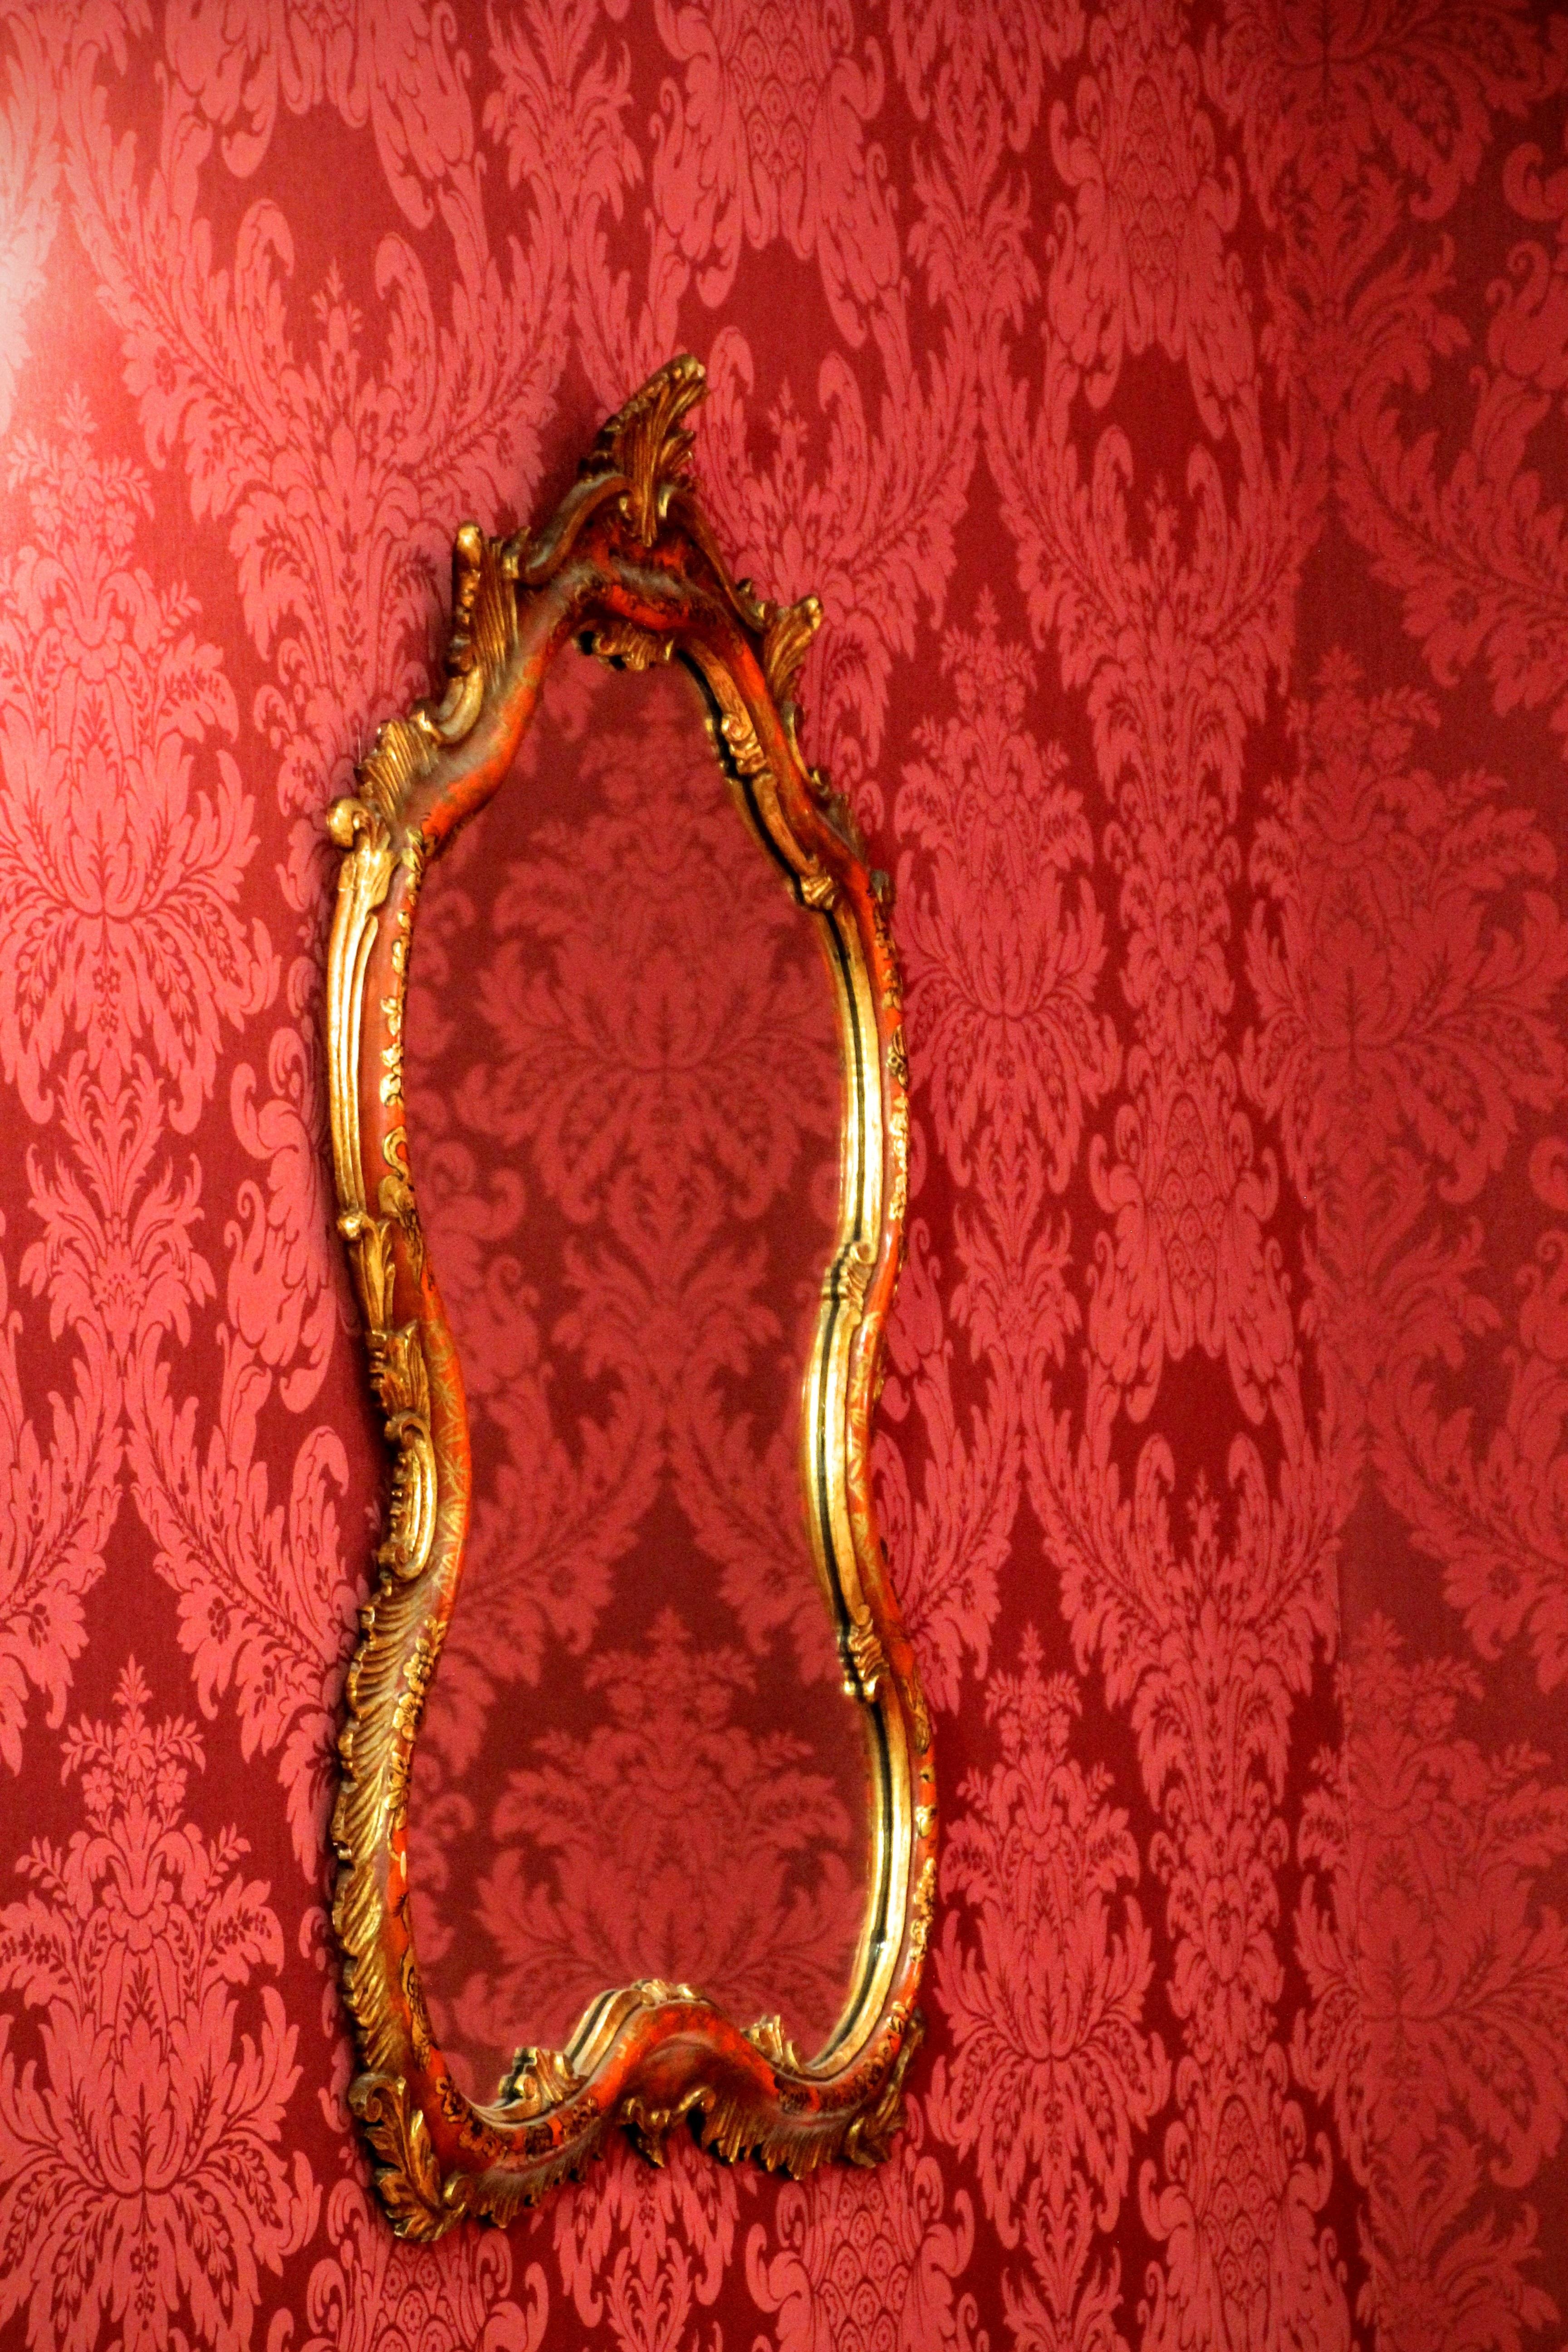 Fotos gratis : ligero, patrón, rojo, nostalgia, circulo, ornamento ...